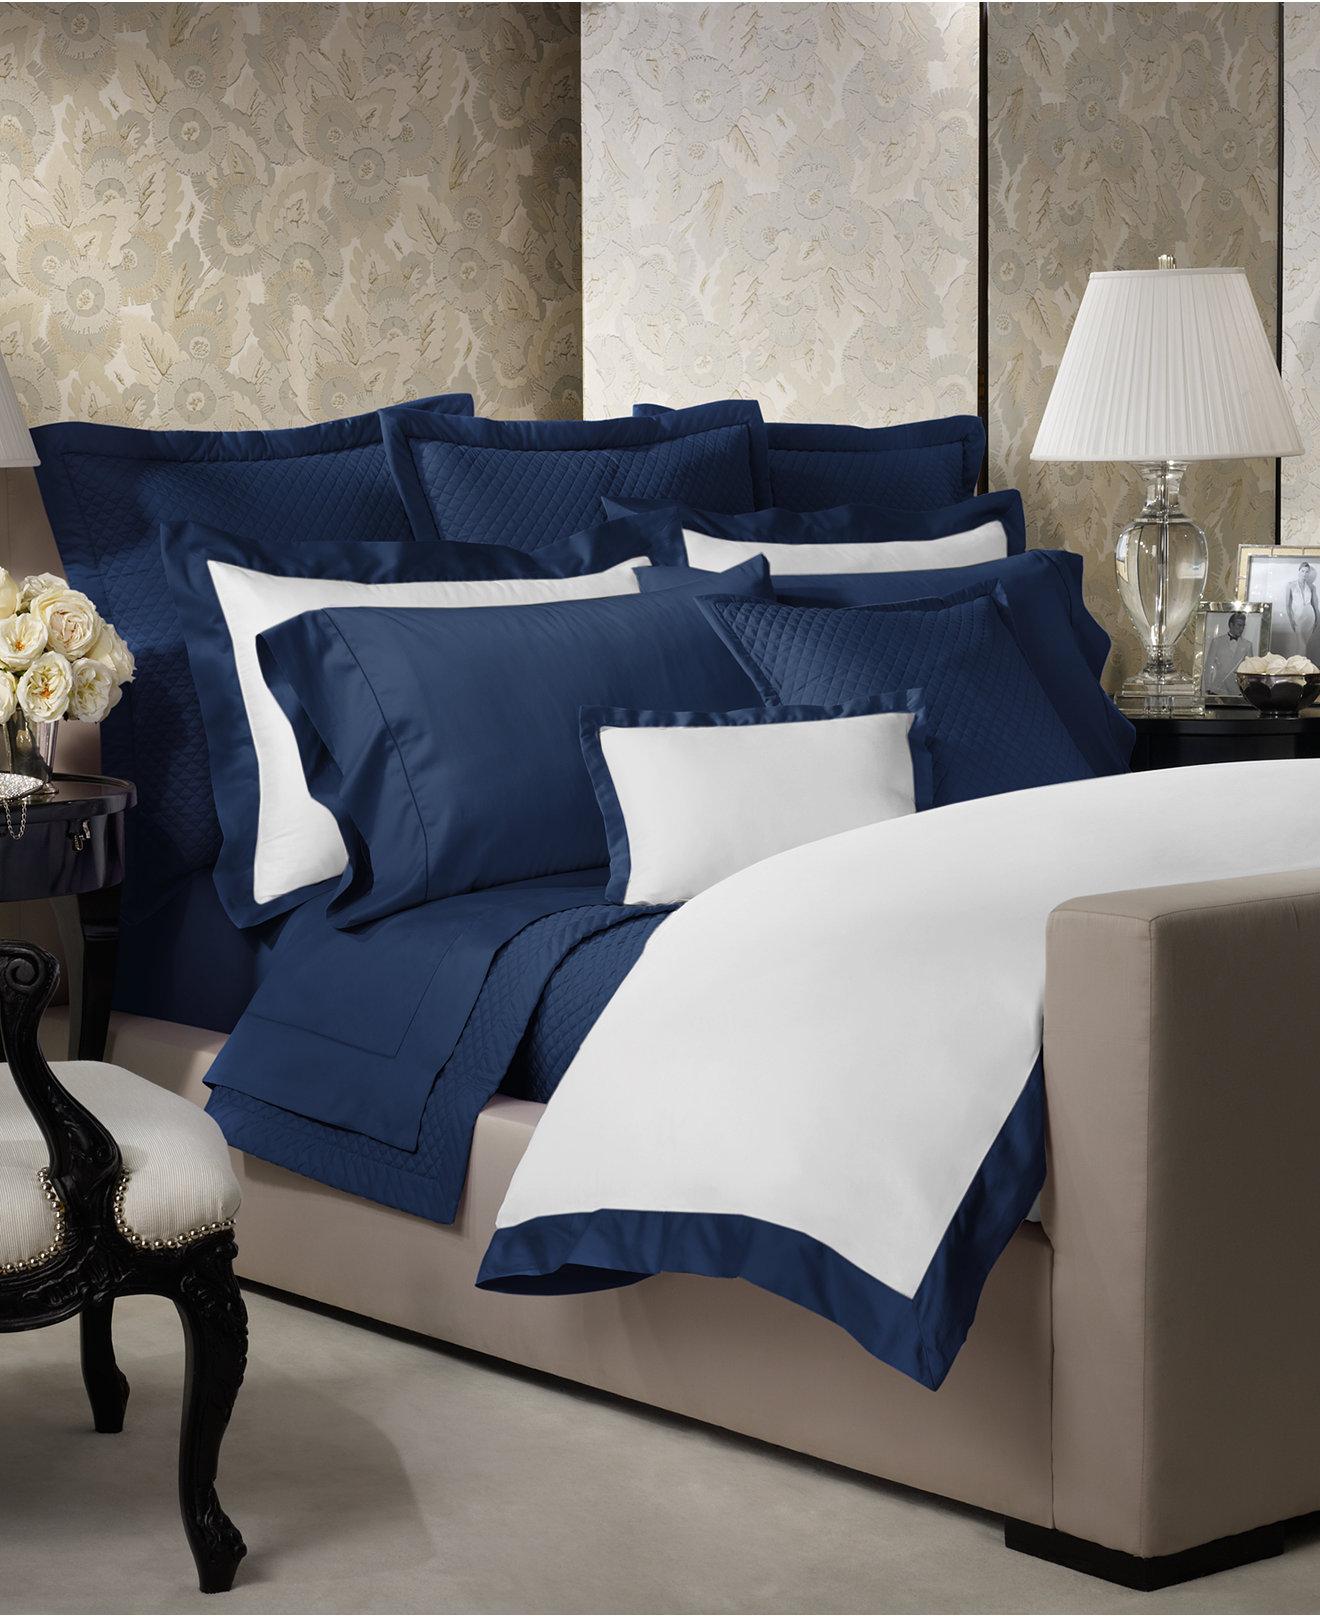 Ralph lauren home bedding - Ralph Lauren Langdon Border Bedding Collection 624 Thread Count 100 Pima Cotton White Bedding Slp Macy S